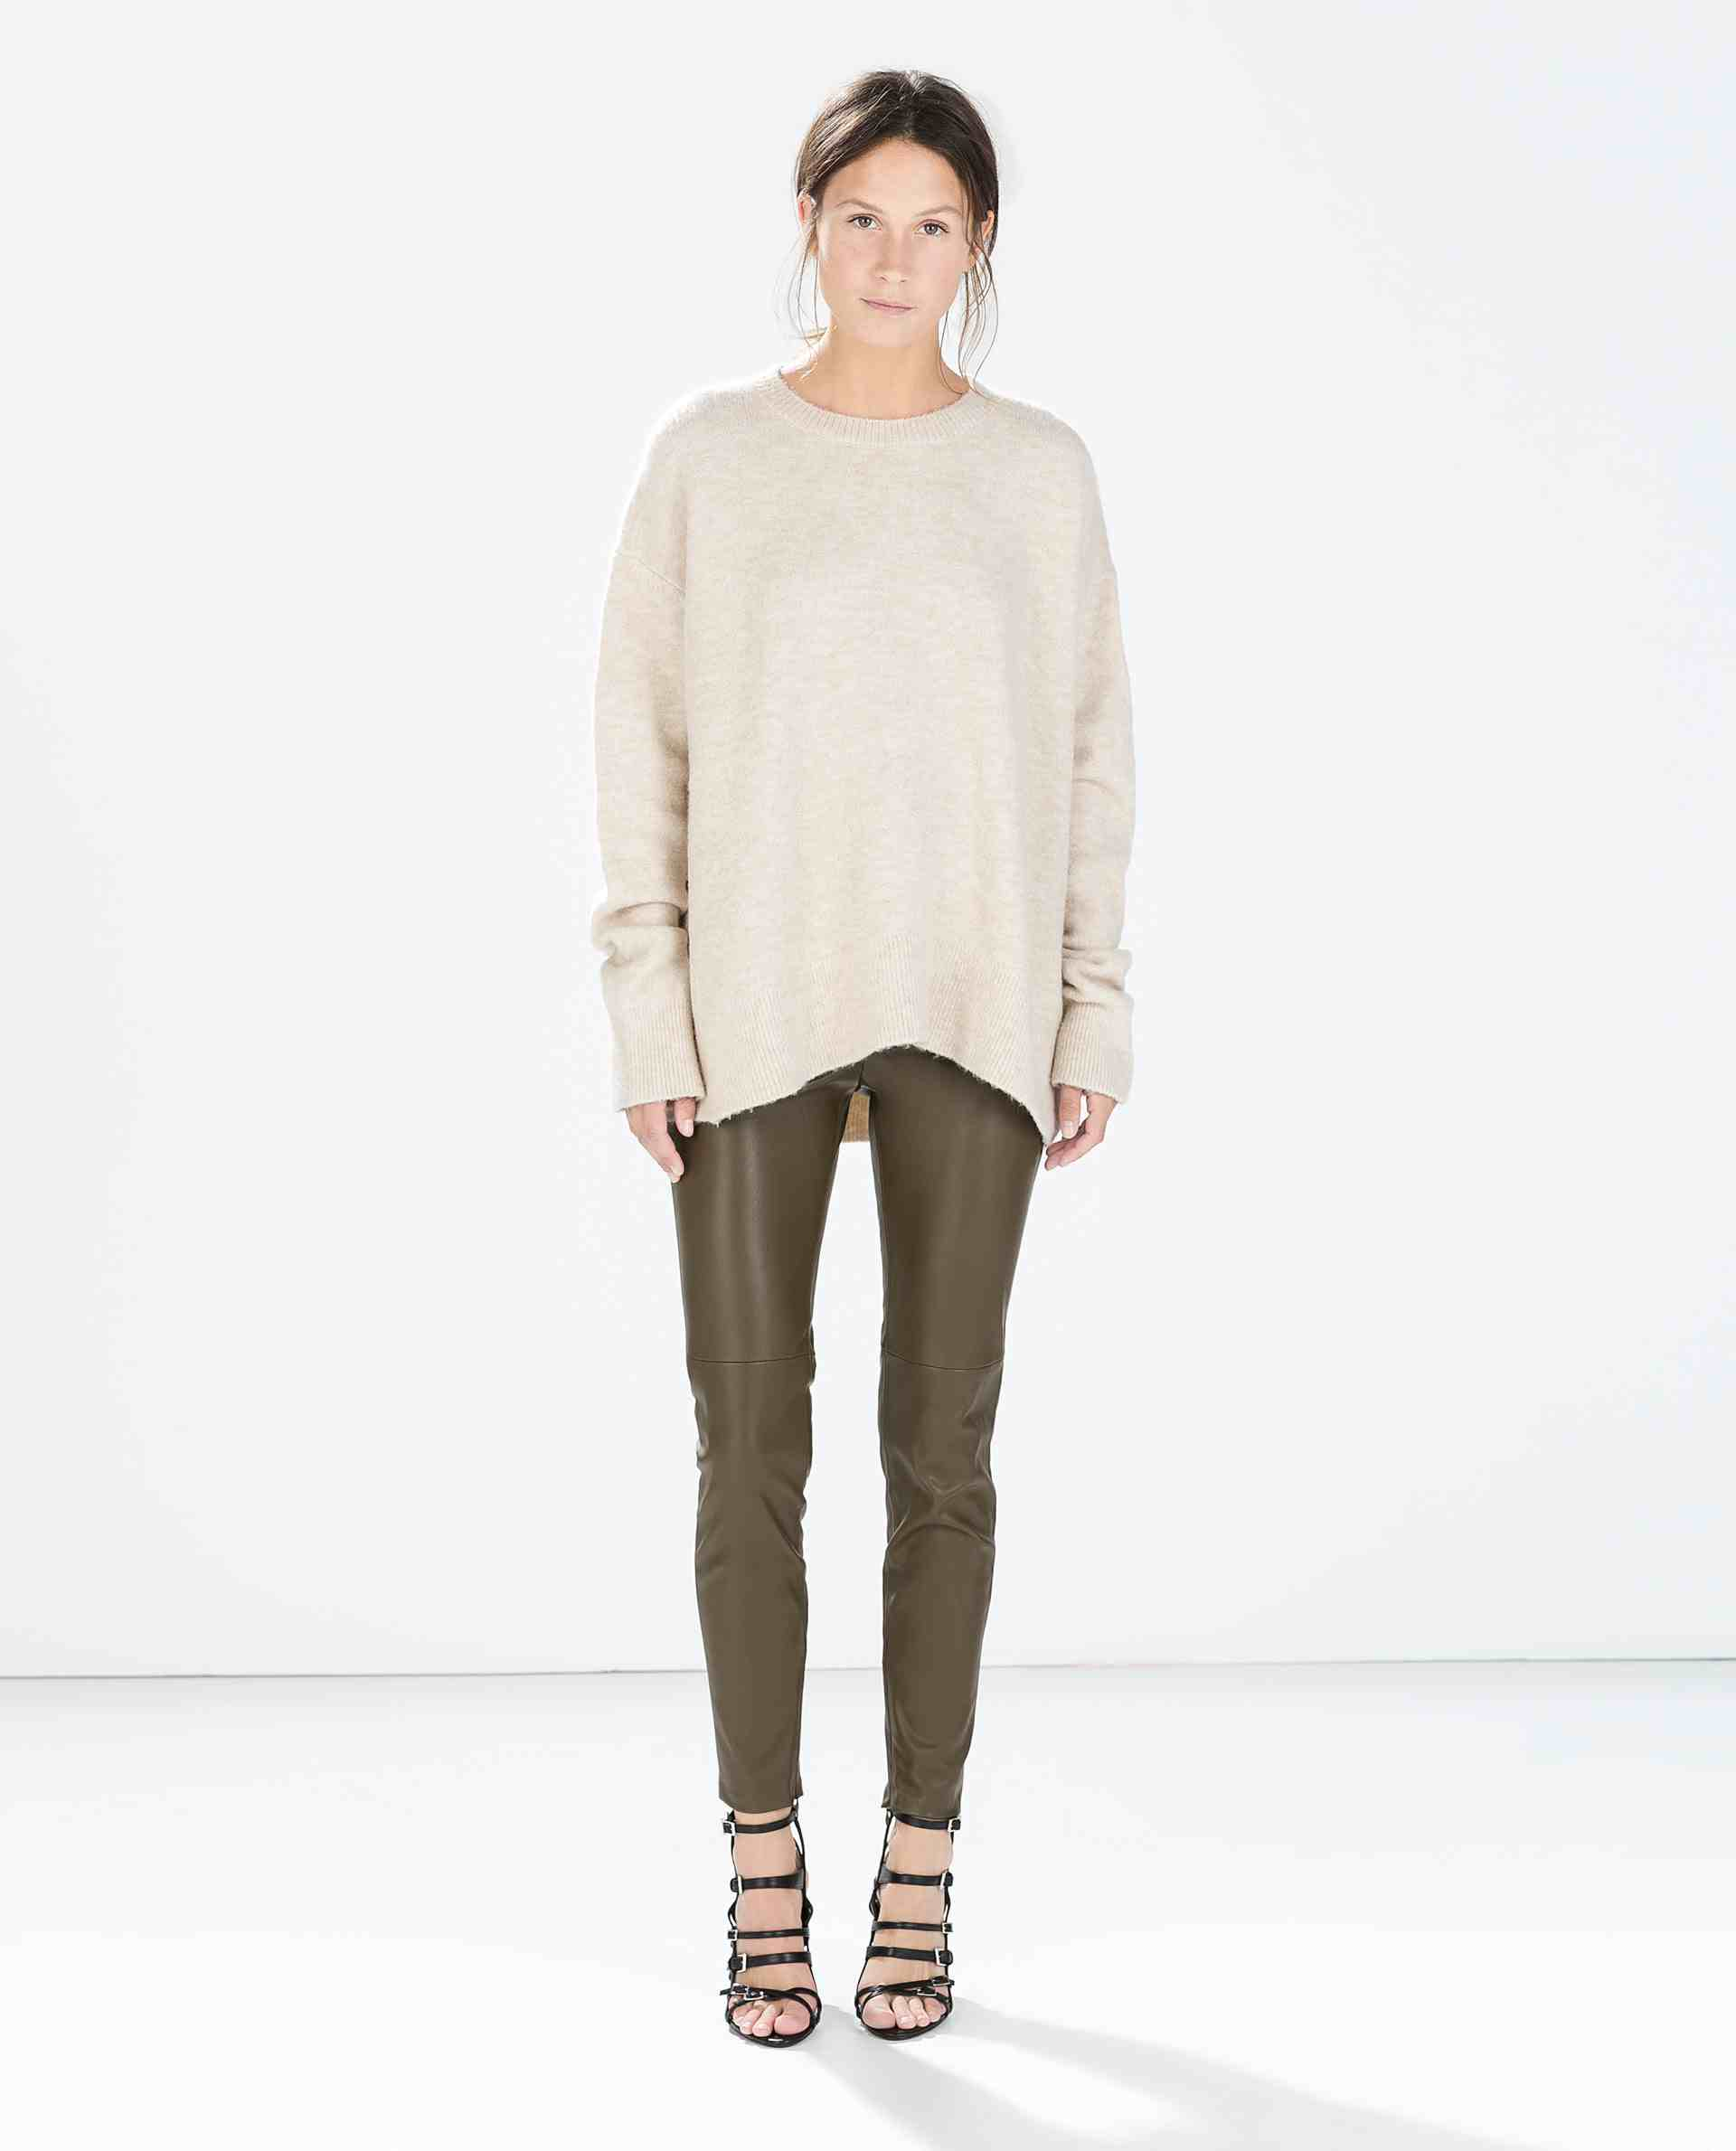 Zara - Legging(30 €)